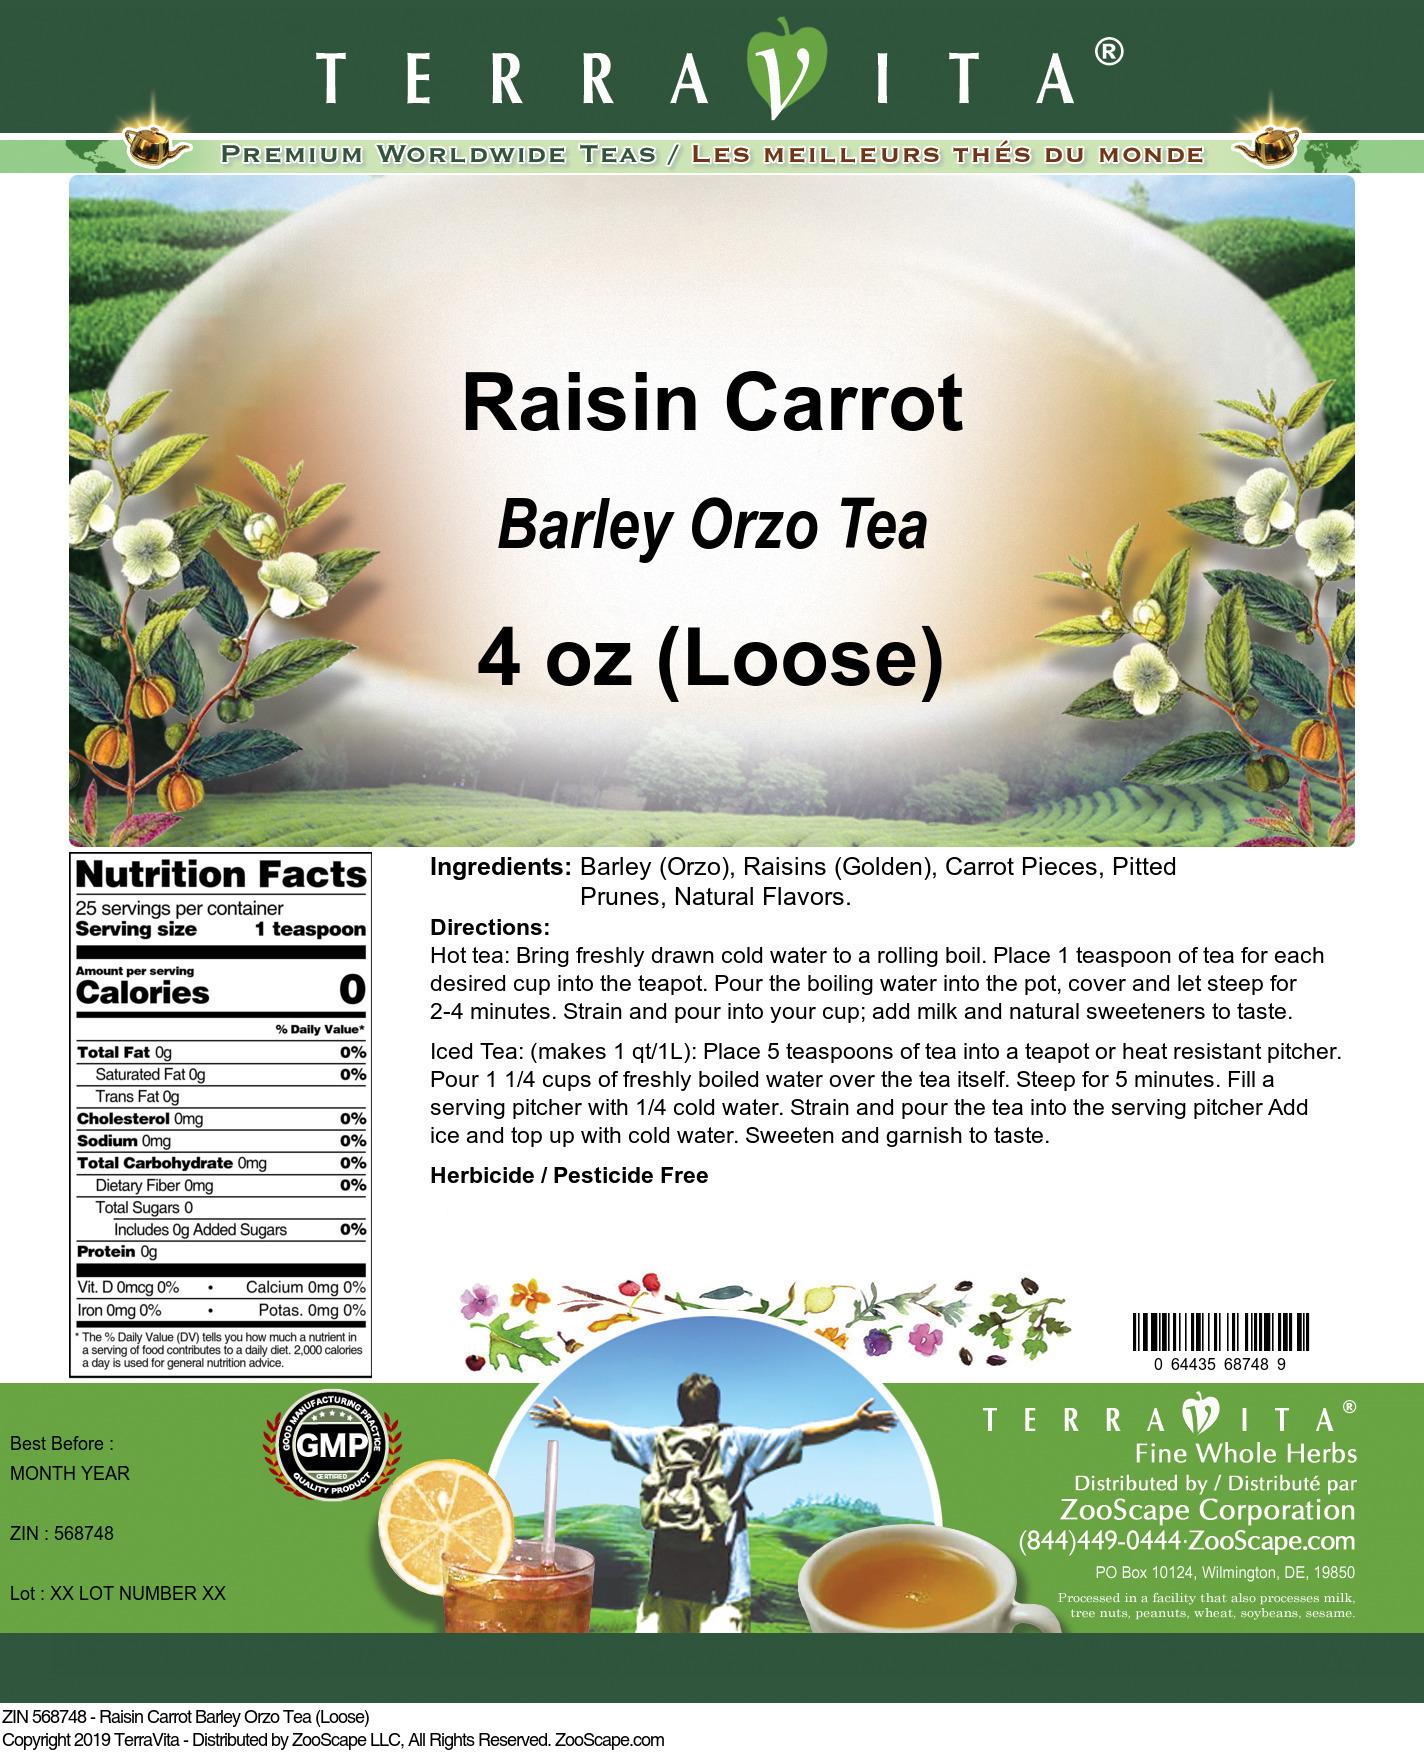 Raisin Carrot Barley Orzo